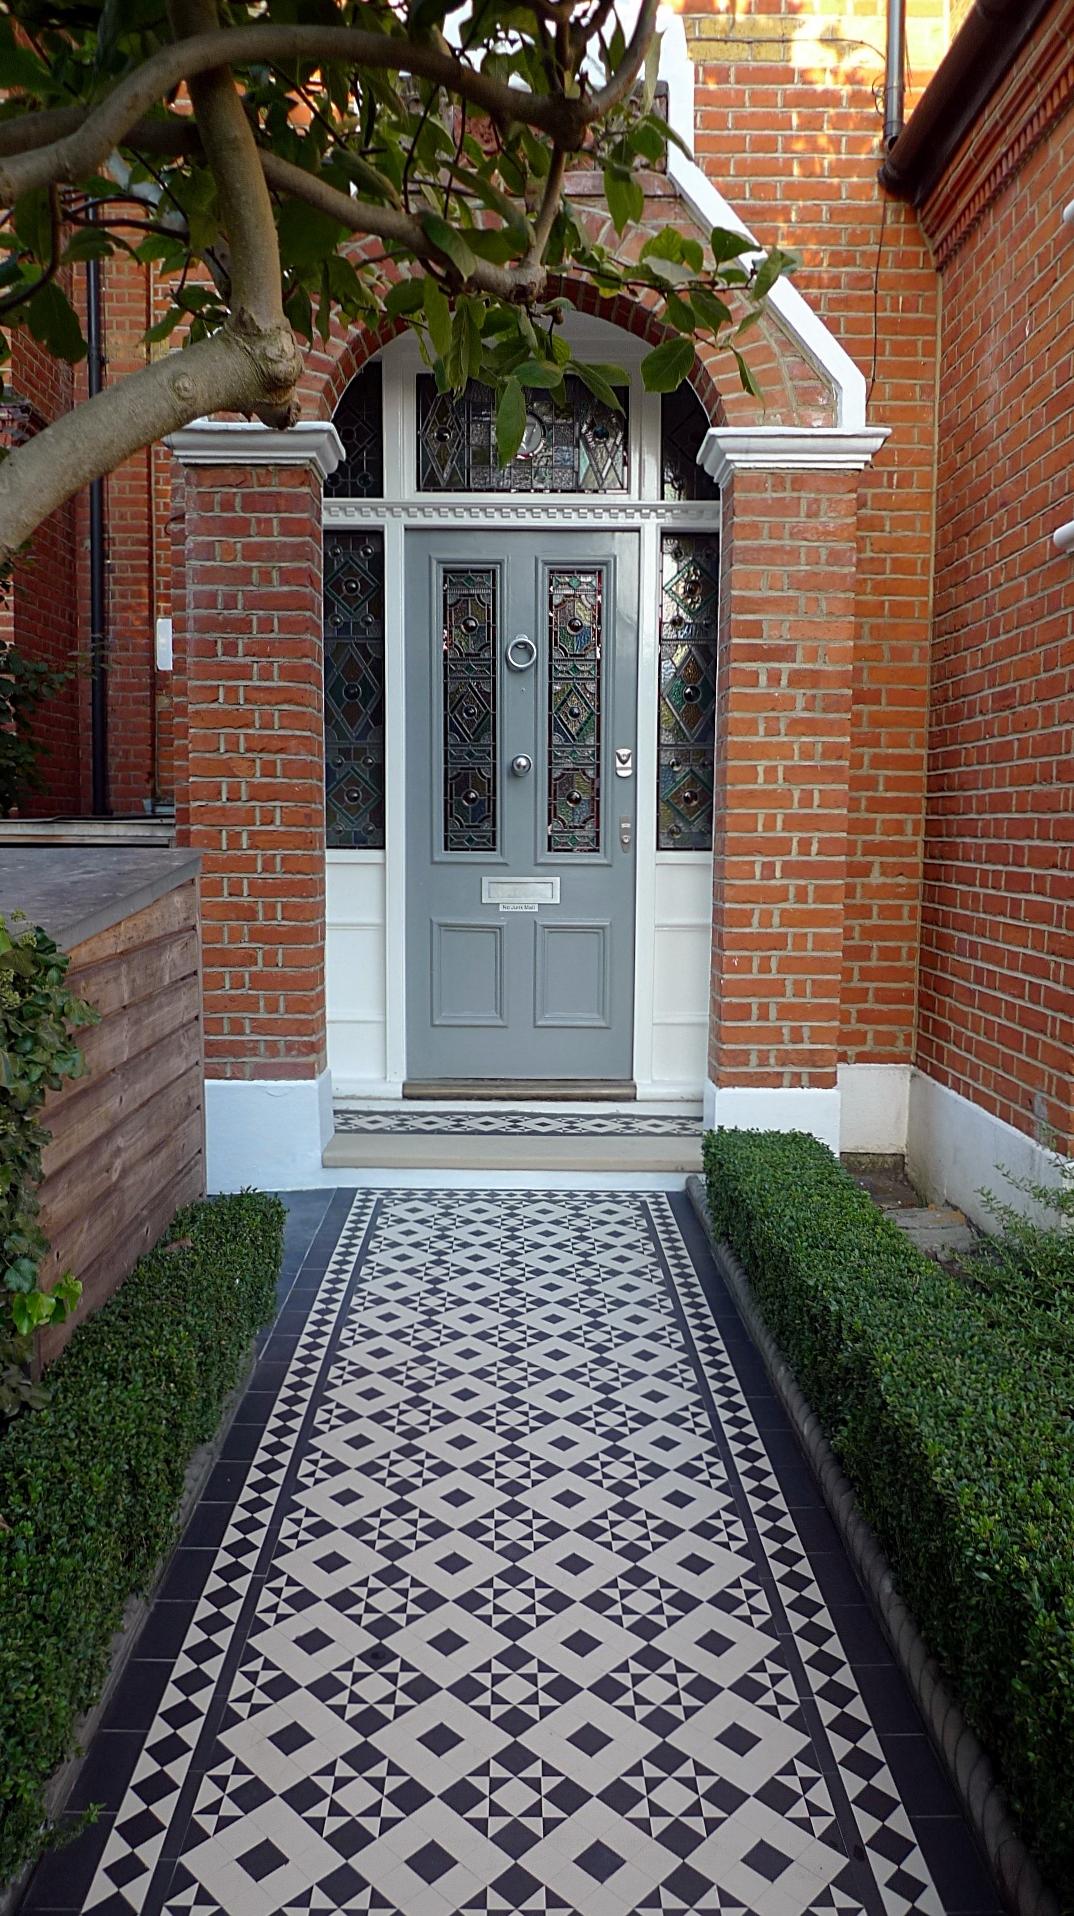 Mosaic Tile Path Mosaic Tile Path Battersea